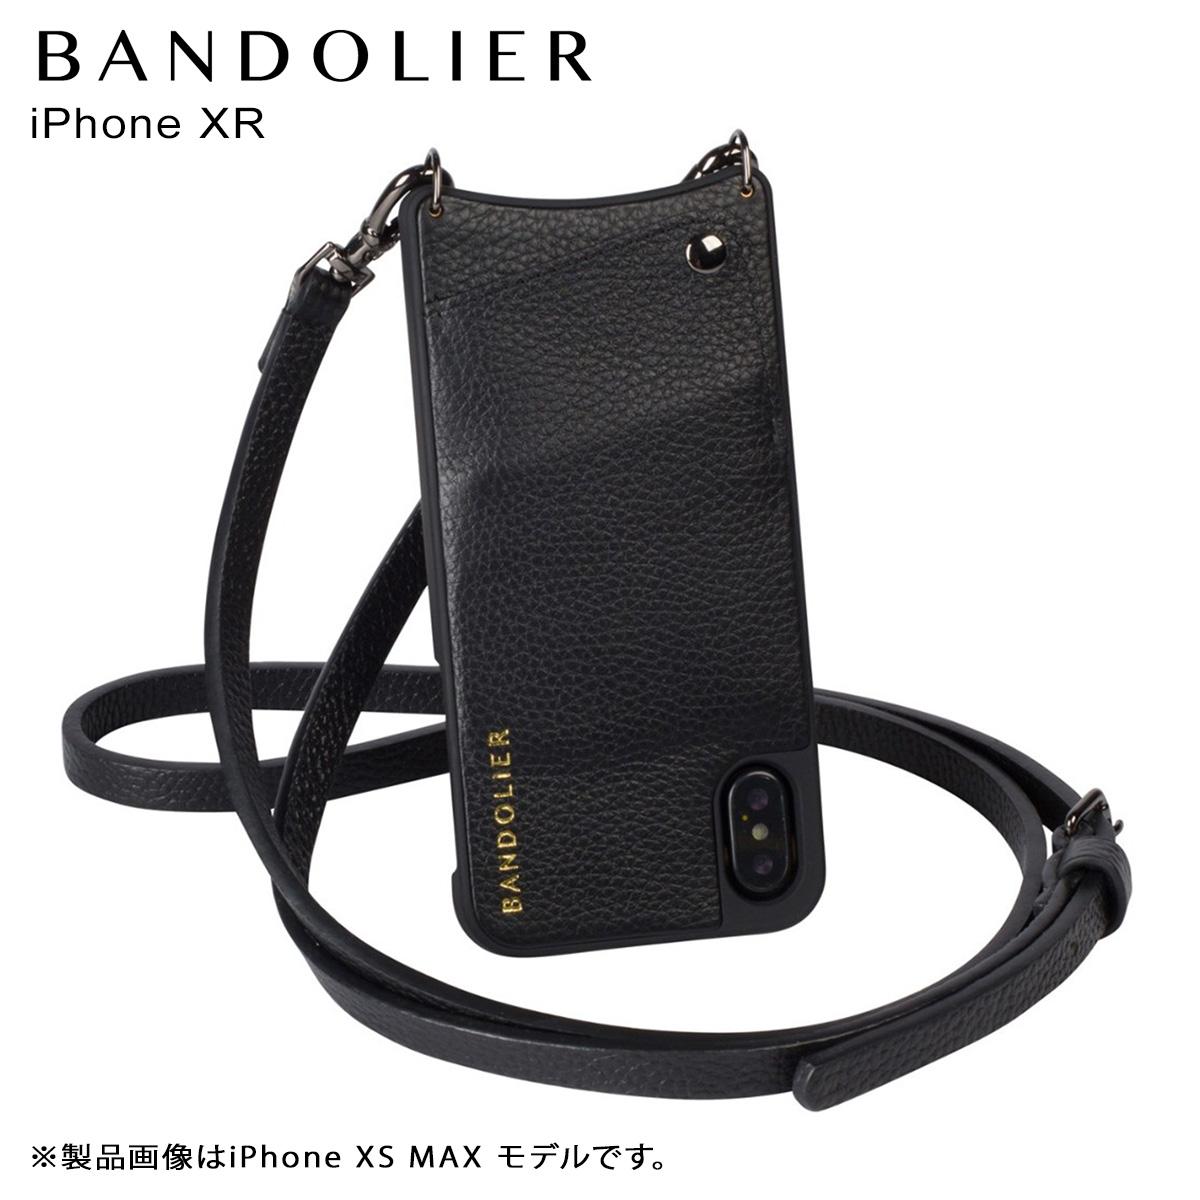 BANDOLIER iPhone XR EMMA PEWTER バンドリヤー ケース ショルダー スマホ アイフォン レザー メンズ レディース ブラック 10EMM1001 [4/18 再入荷]